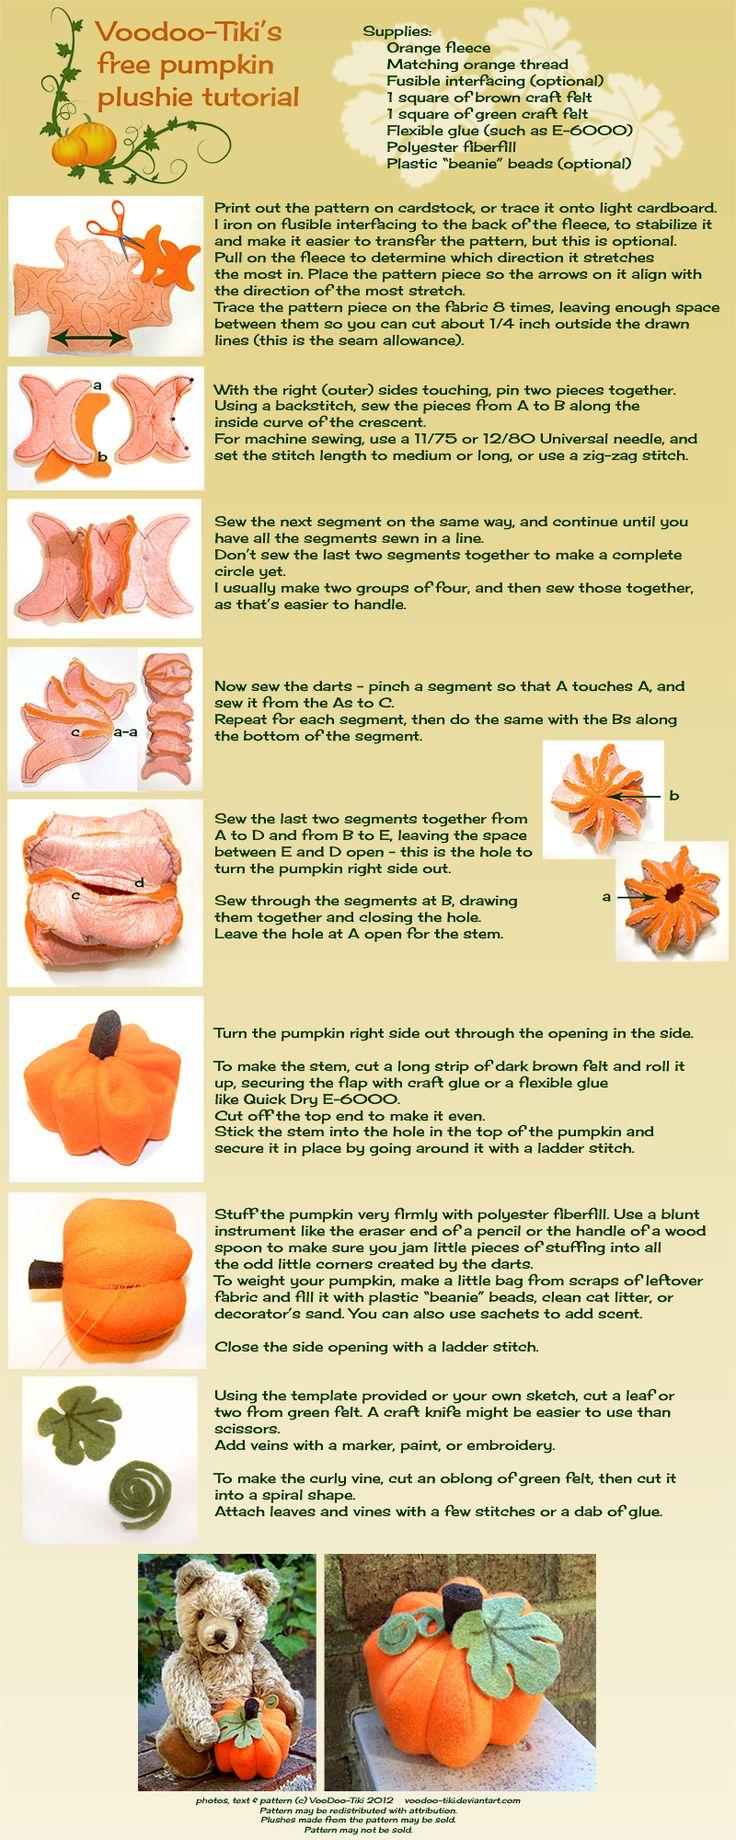 Pumpkin Plushie Tutorial by Voodoo-Tiki.deviantart.com on @deviantART